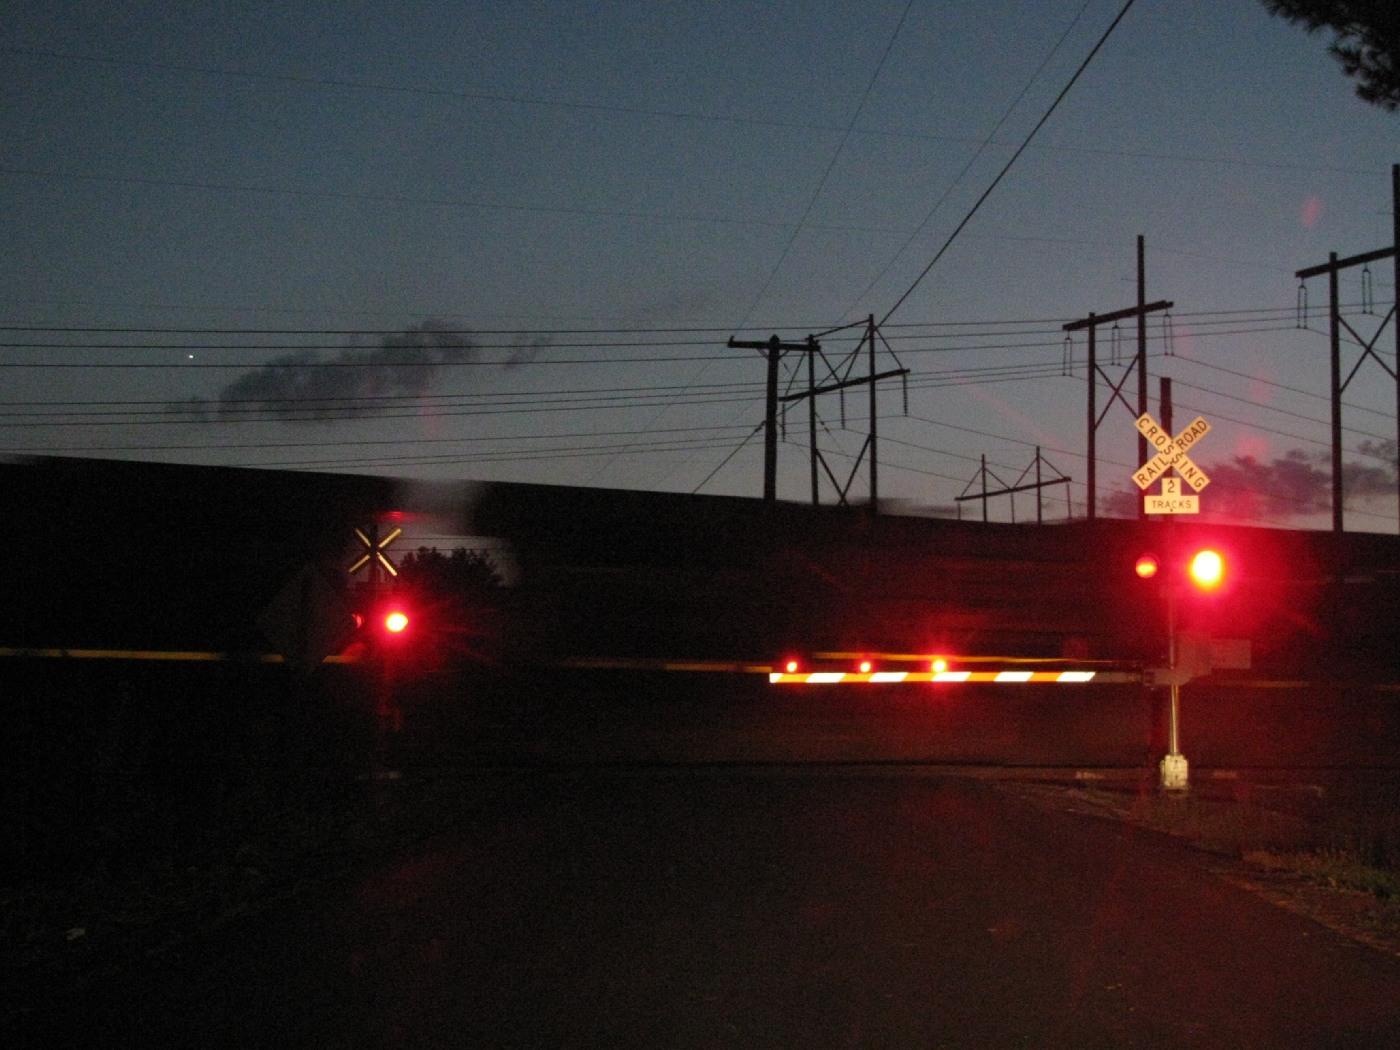 Railroad crossing gate lights imgkid the image